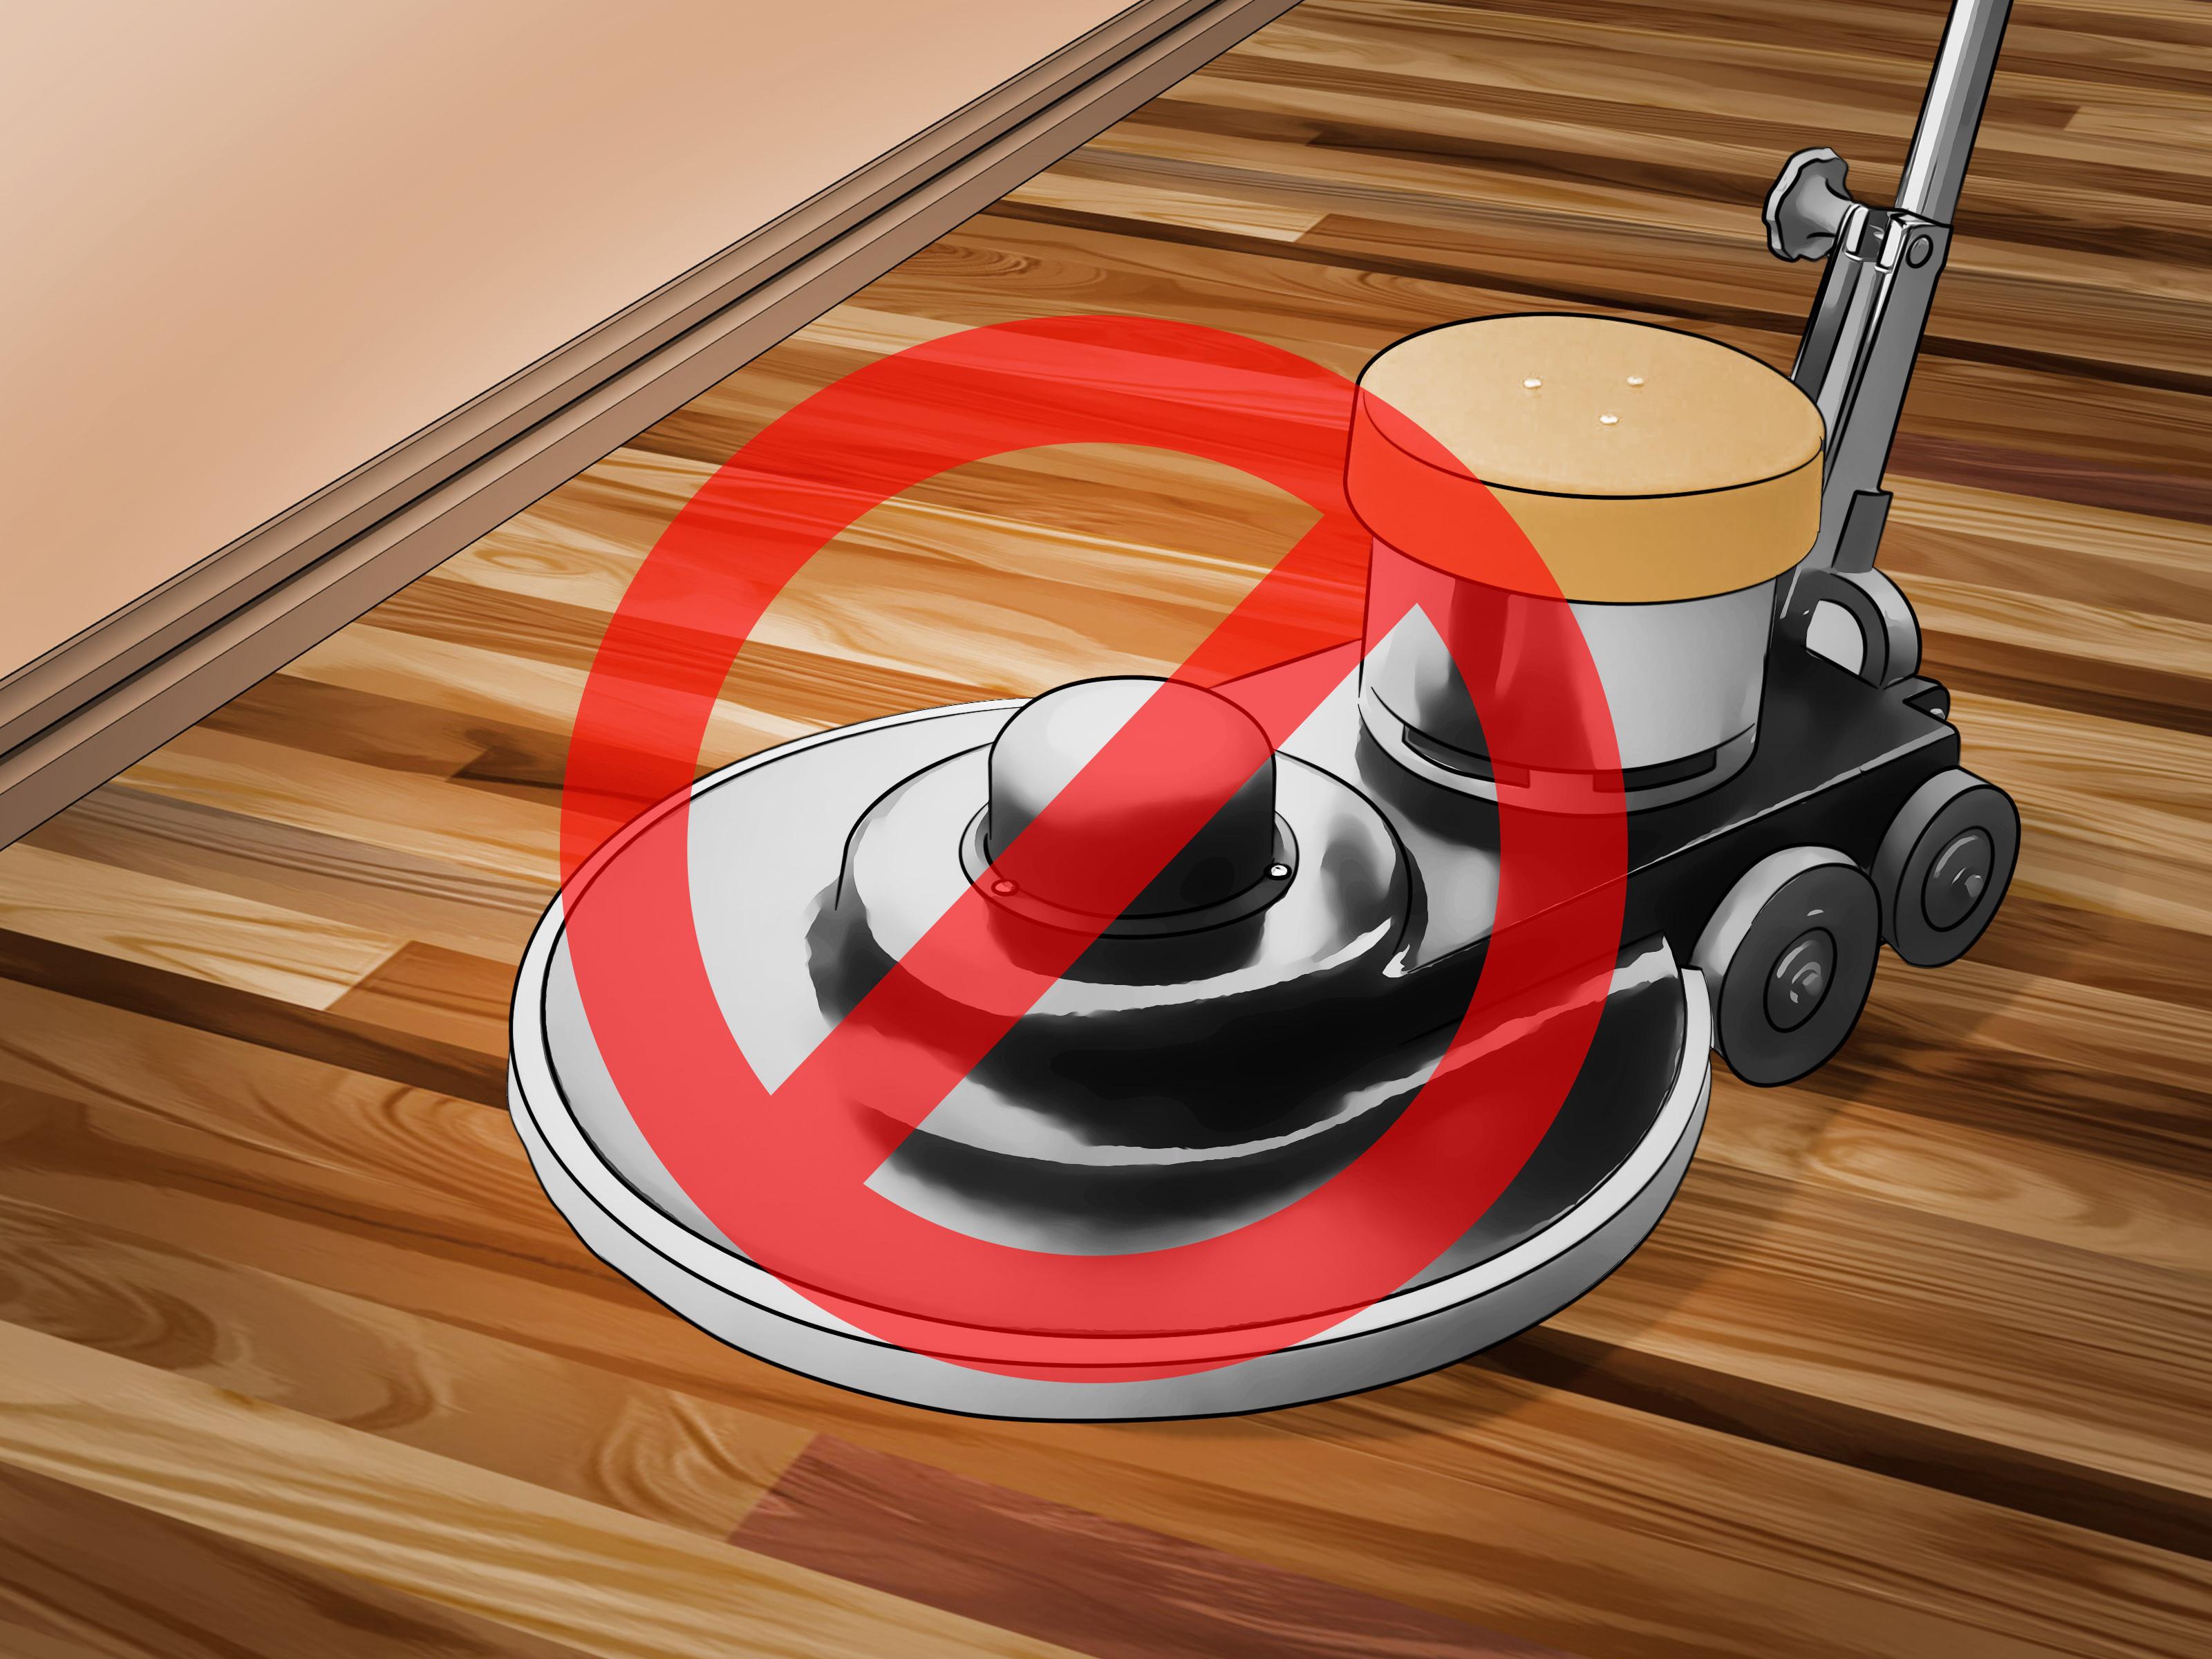 17 Stylish 1 4 Hardwood Flooring 2021 free download 1 4 hardwood flooring of 4 ways to clean polyurethane wood floors wikihow throughout clean polyurethane wood floors step 15